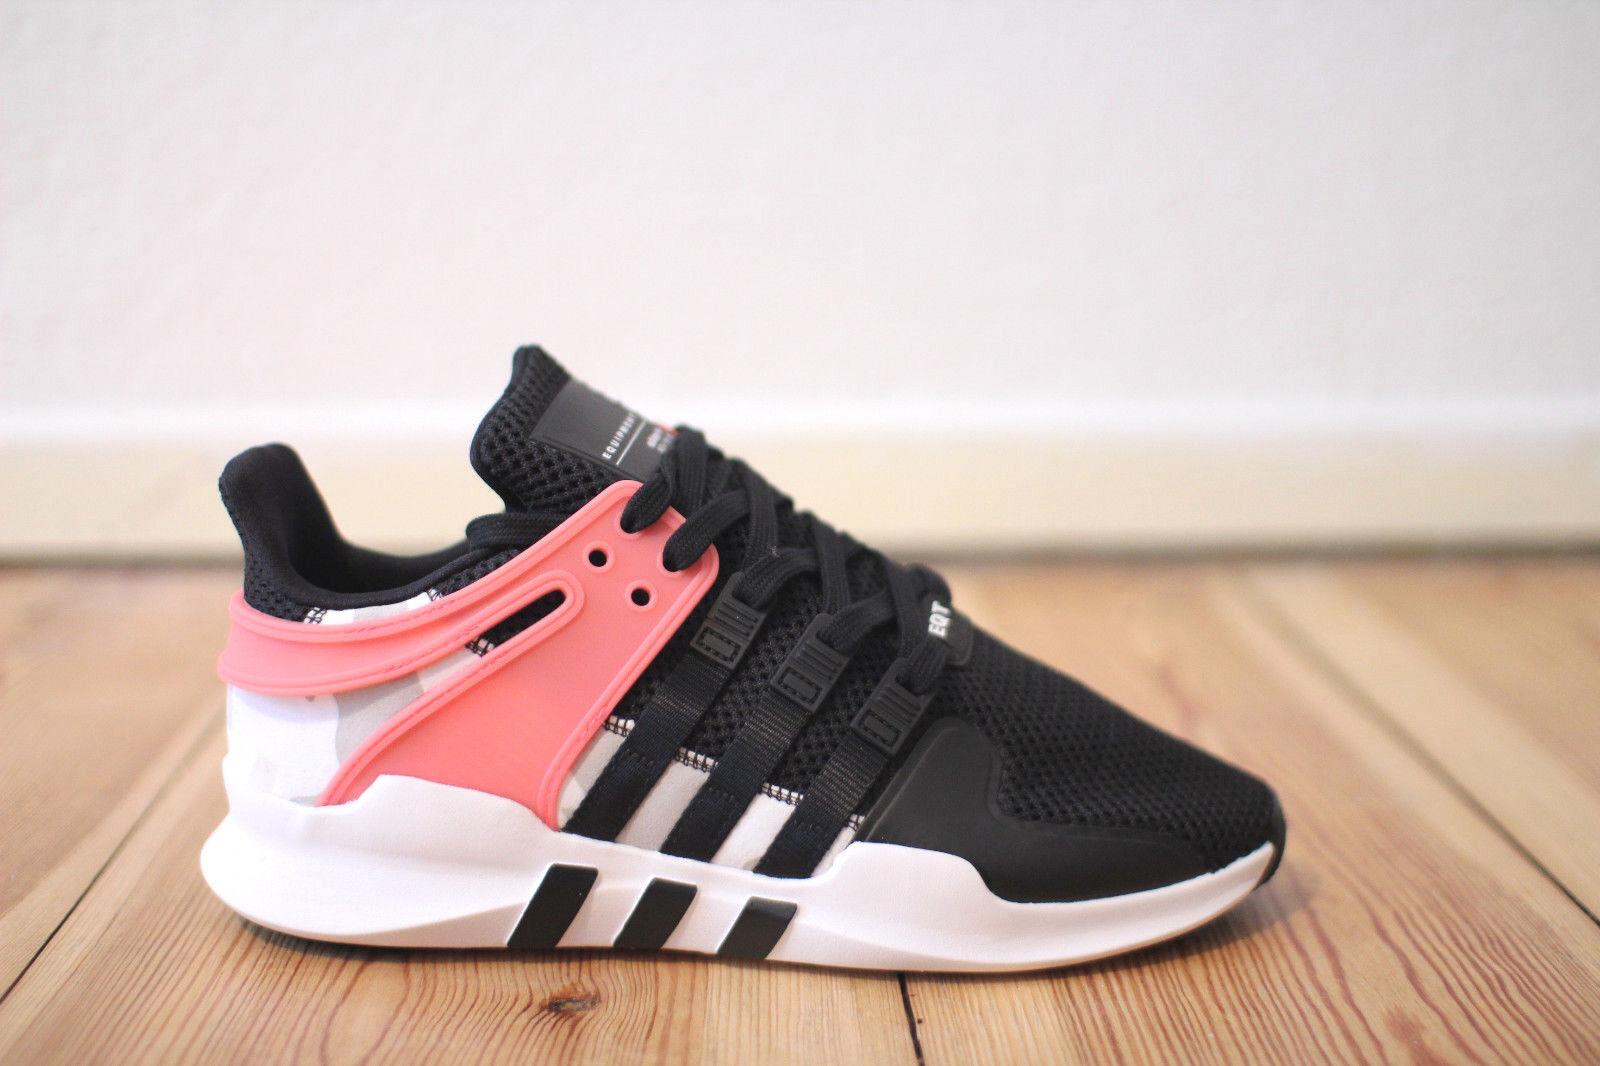 Adidas 42,44,45,46 EQT Support ADV Weiß Schwarz Pink Gr. 42,44,45,46 Adidas NEU & OVP Equipment 9bd9e9